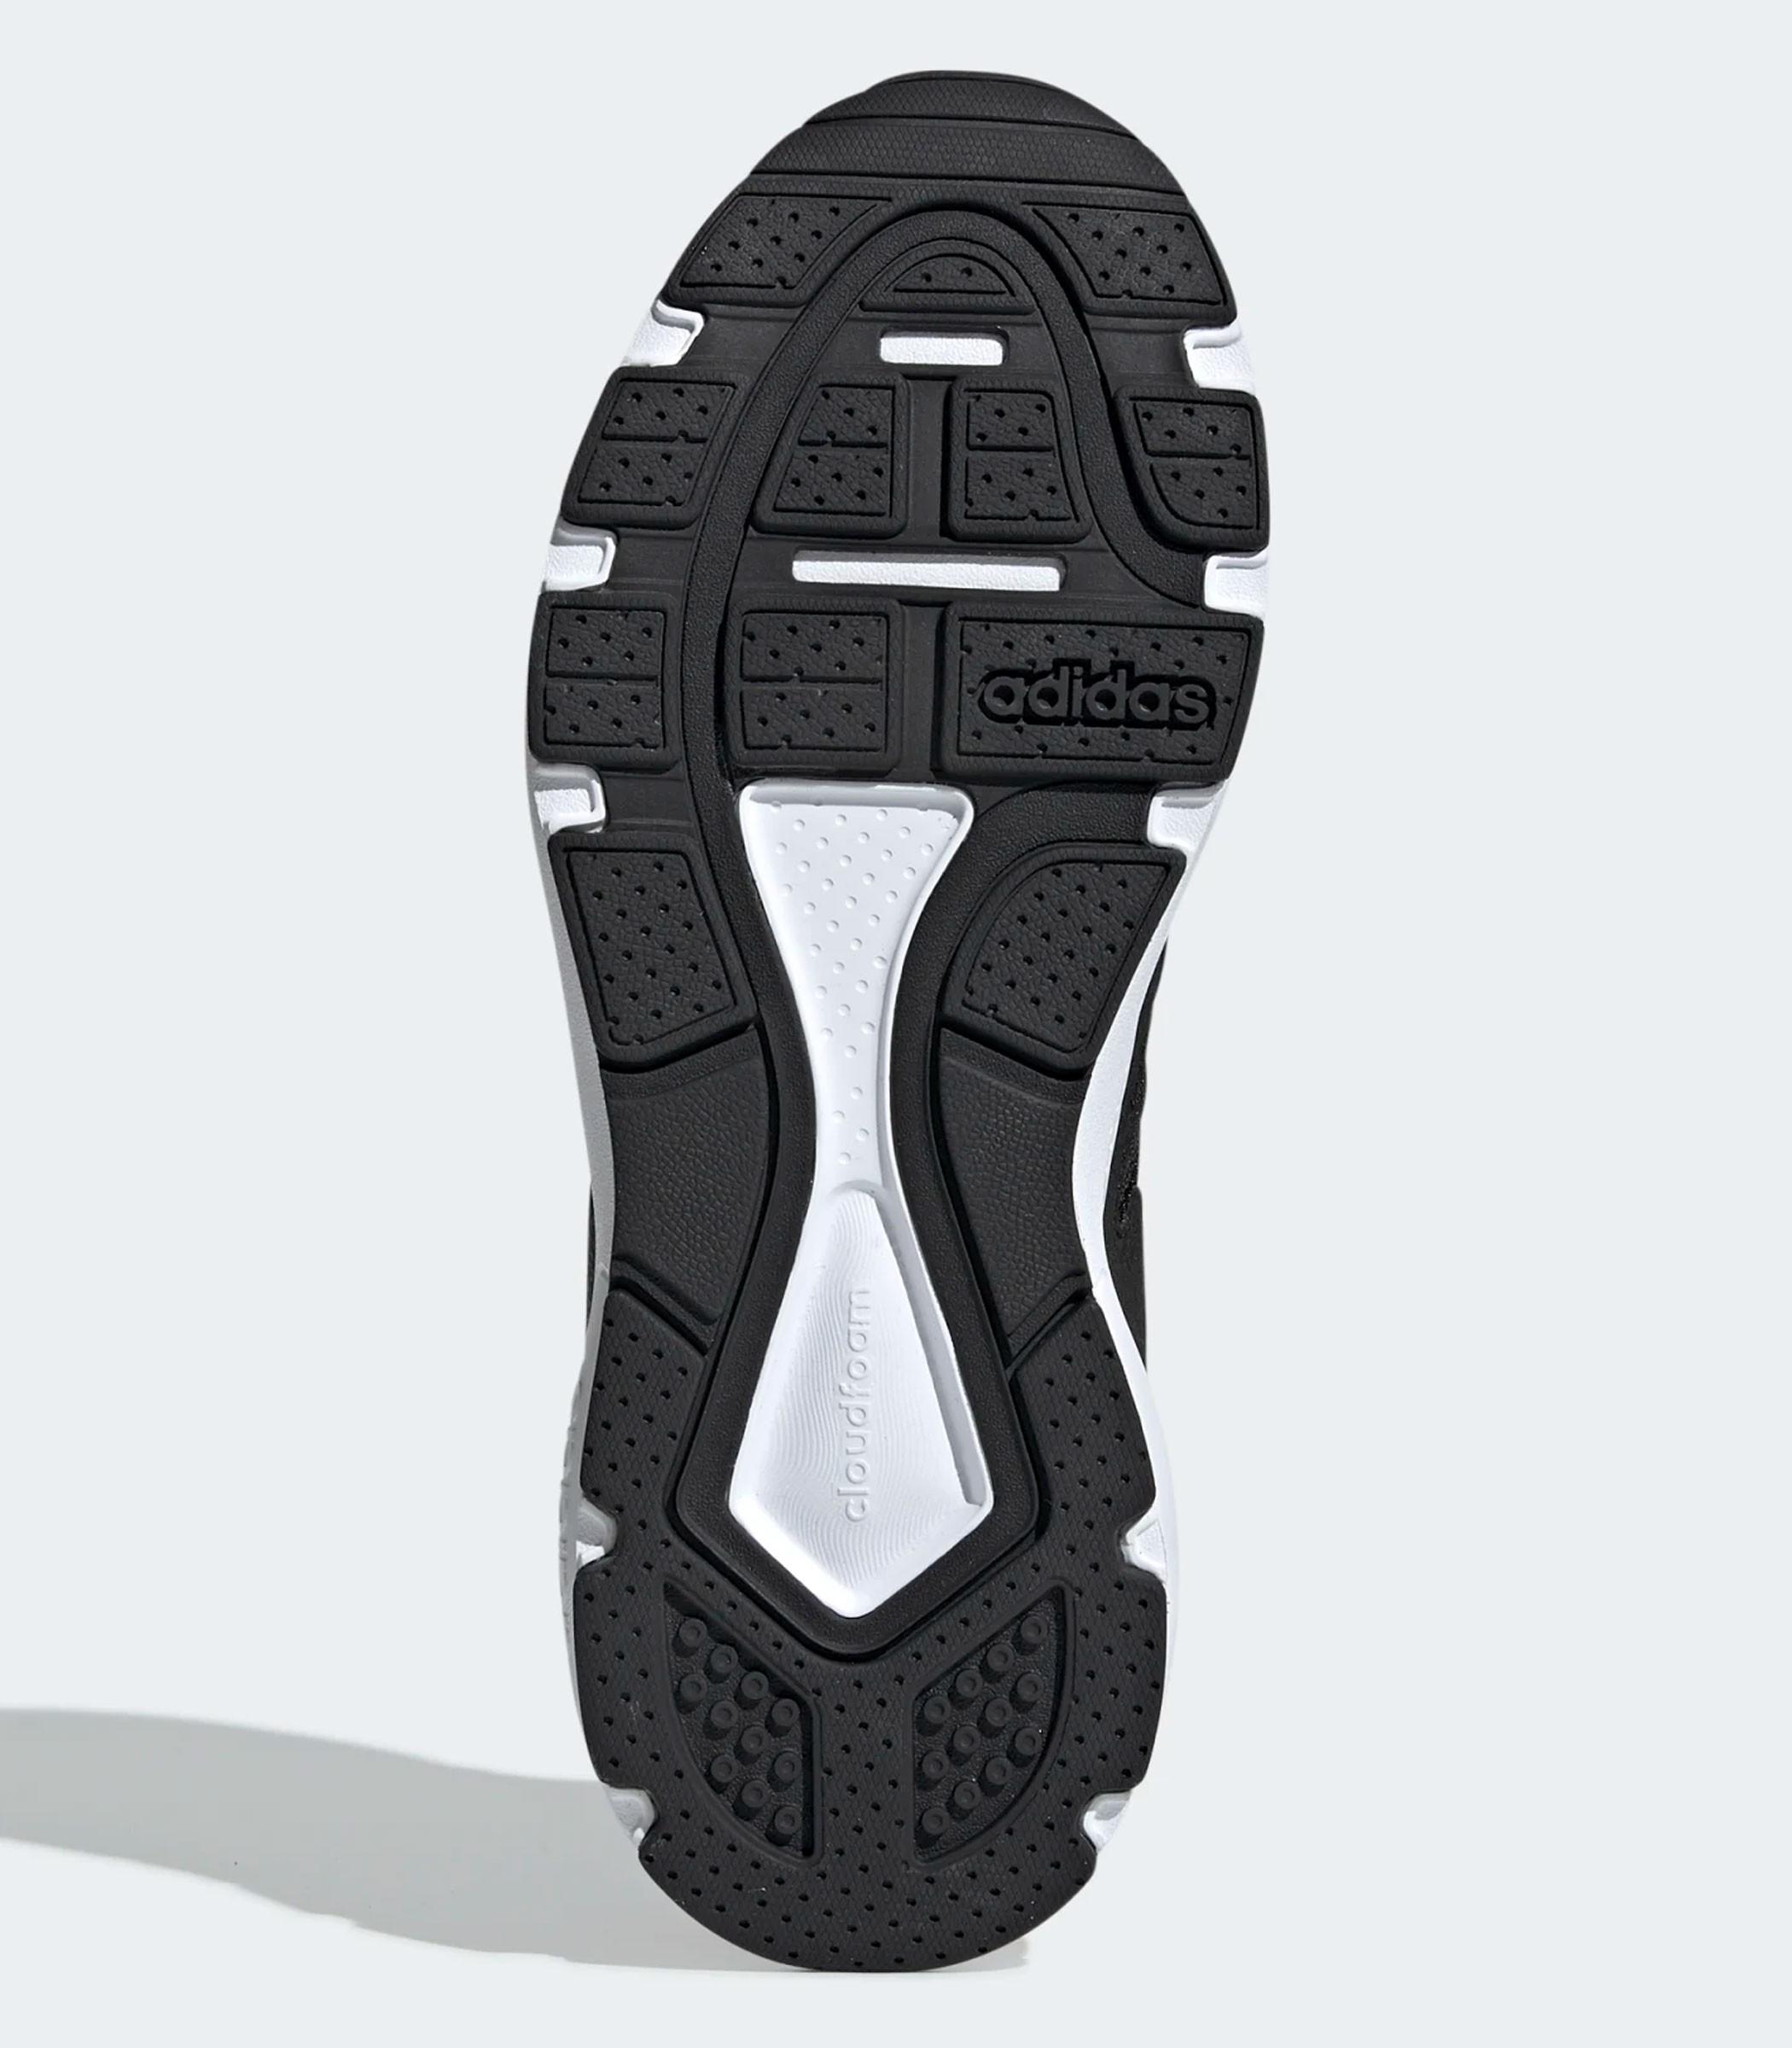 Scarpe Sneakers Adidas Chaos basse nero bianco da uomo rif